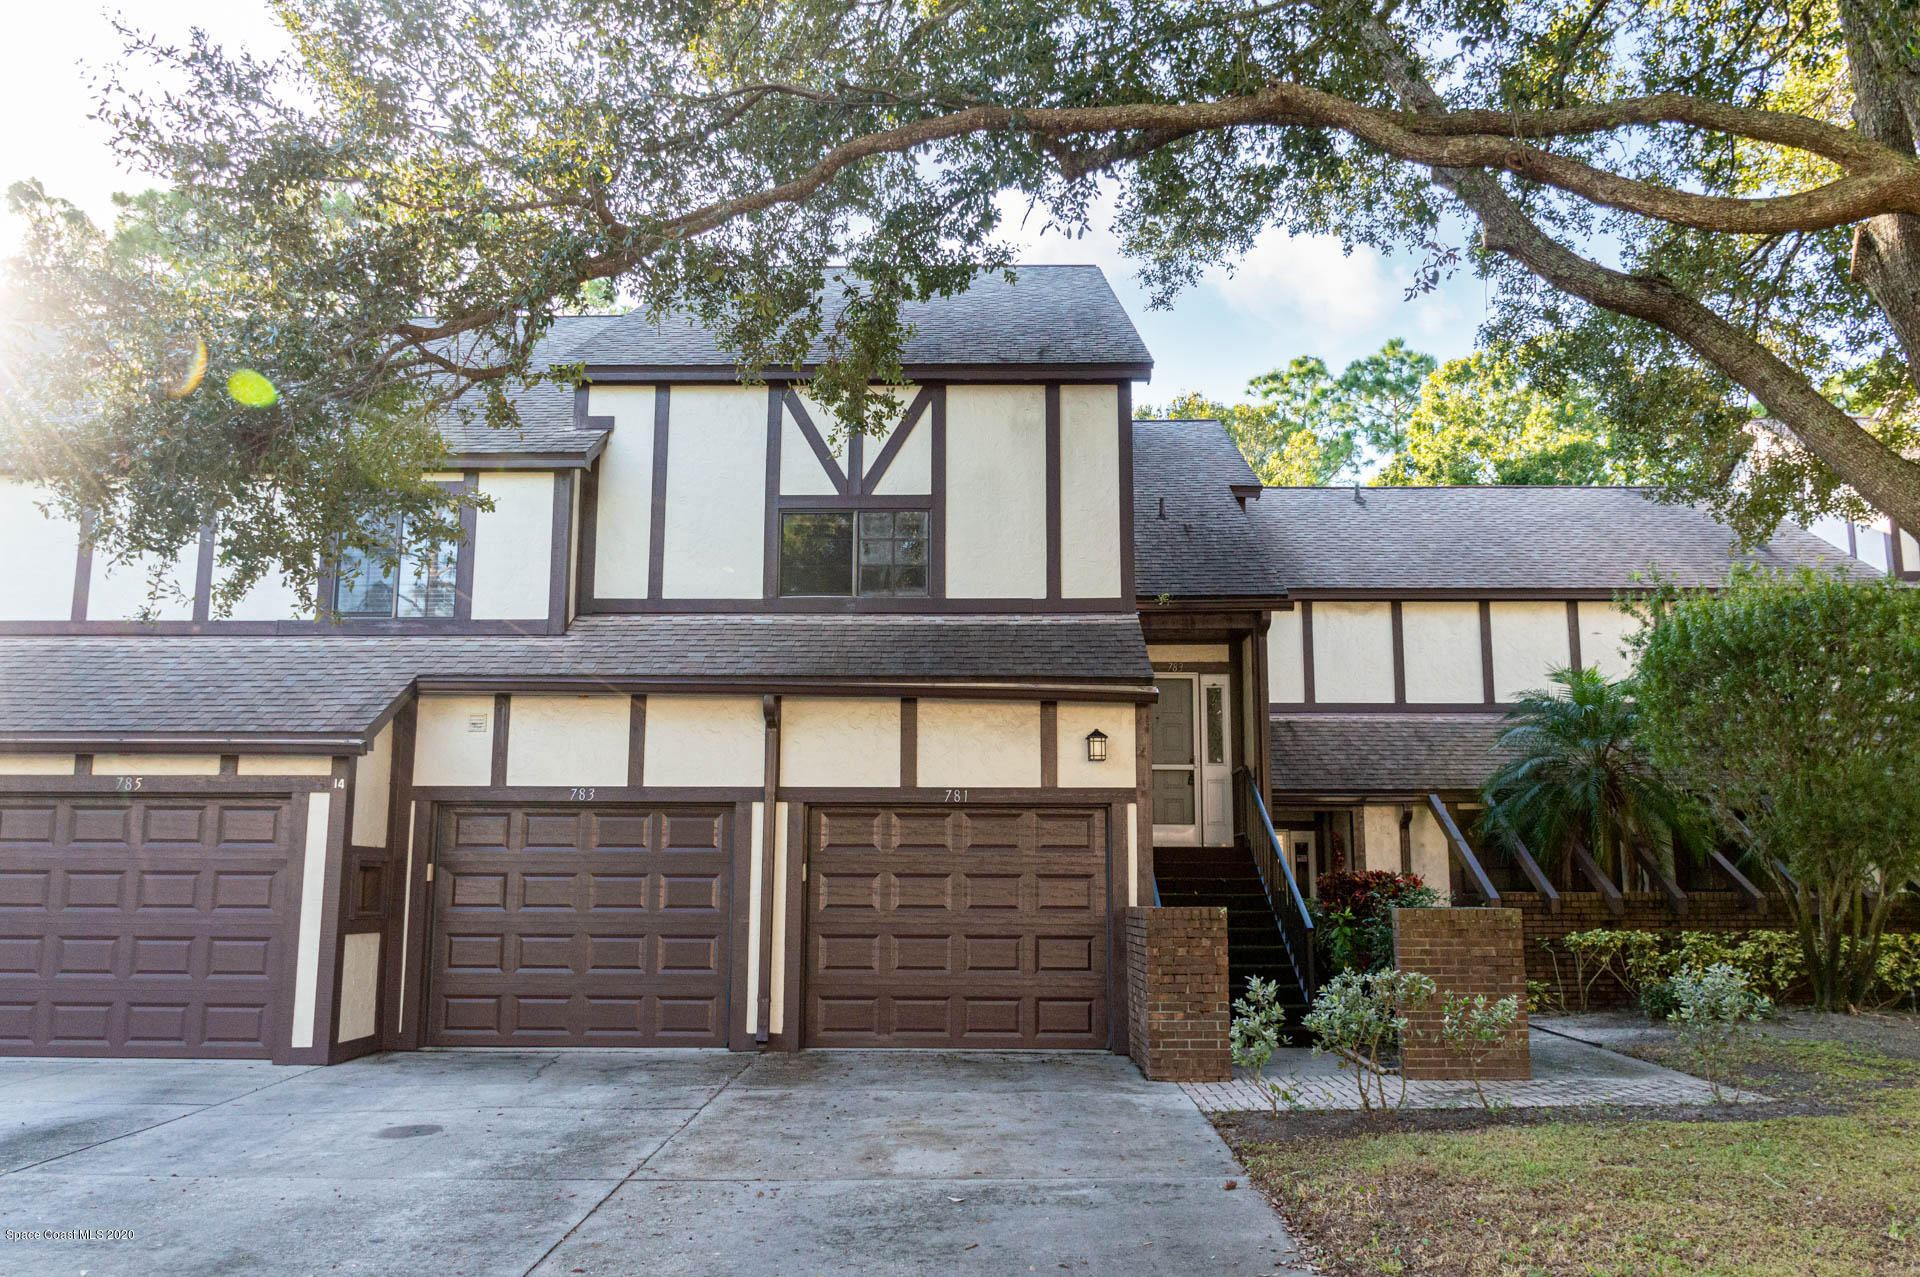 783 Greenwood Manor Circle, Melbourne, FL 32904 - #: 891119